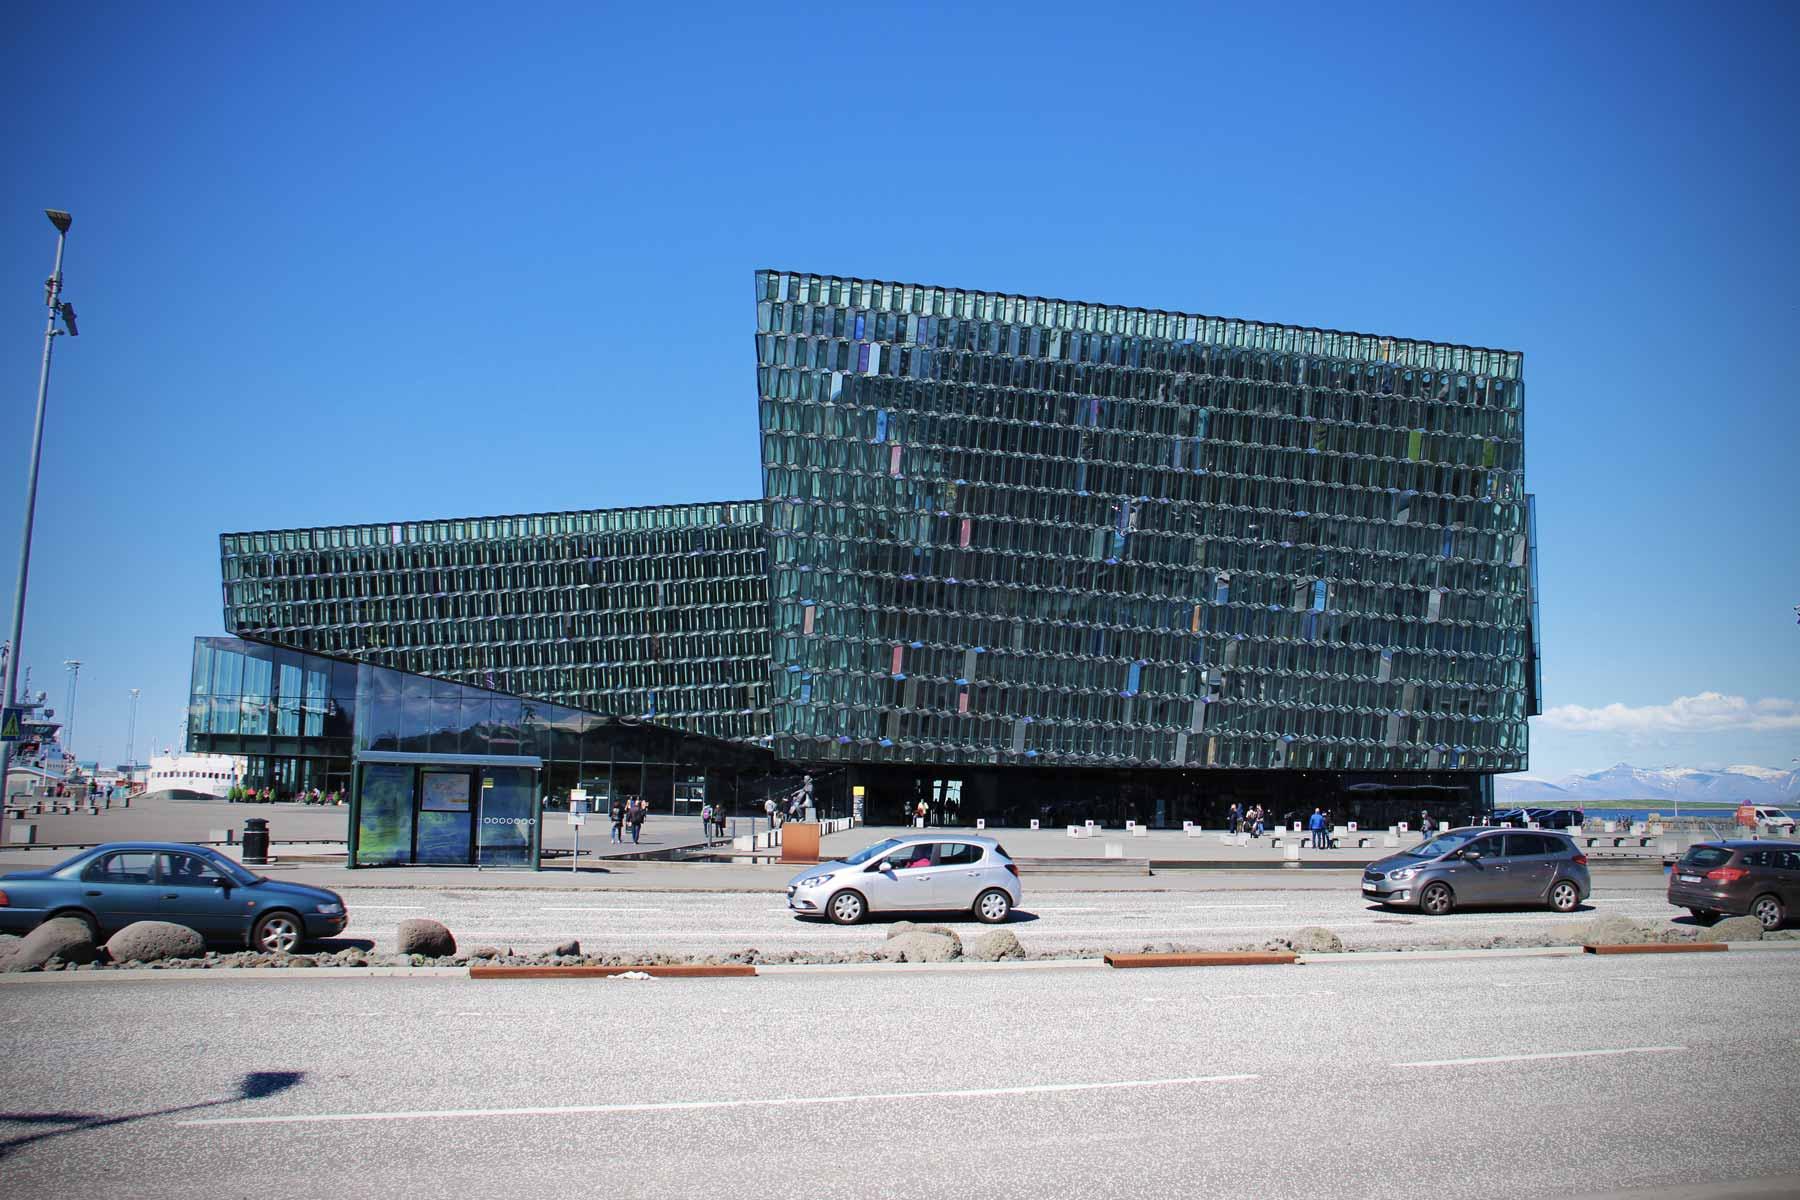 Reykjavik City Tour from Keflavik airport